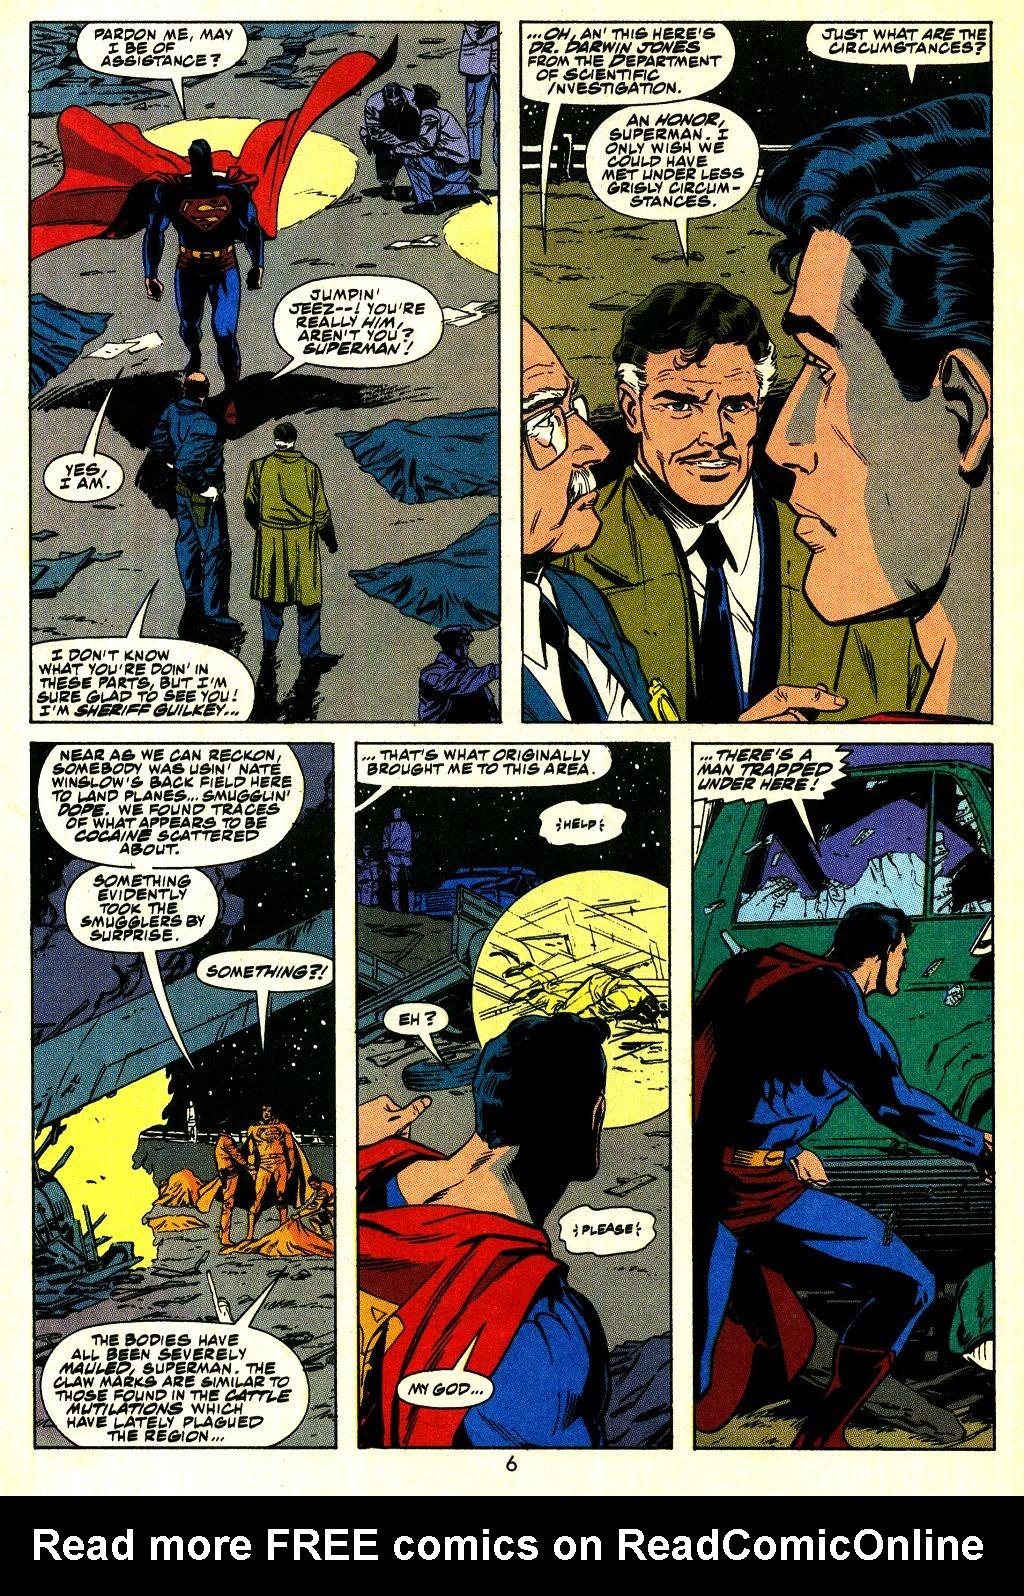 Action Comics (1938) 683 Page 6